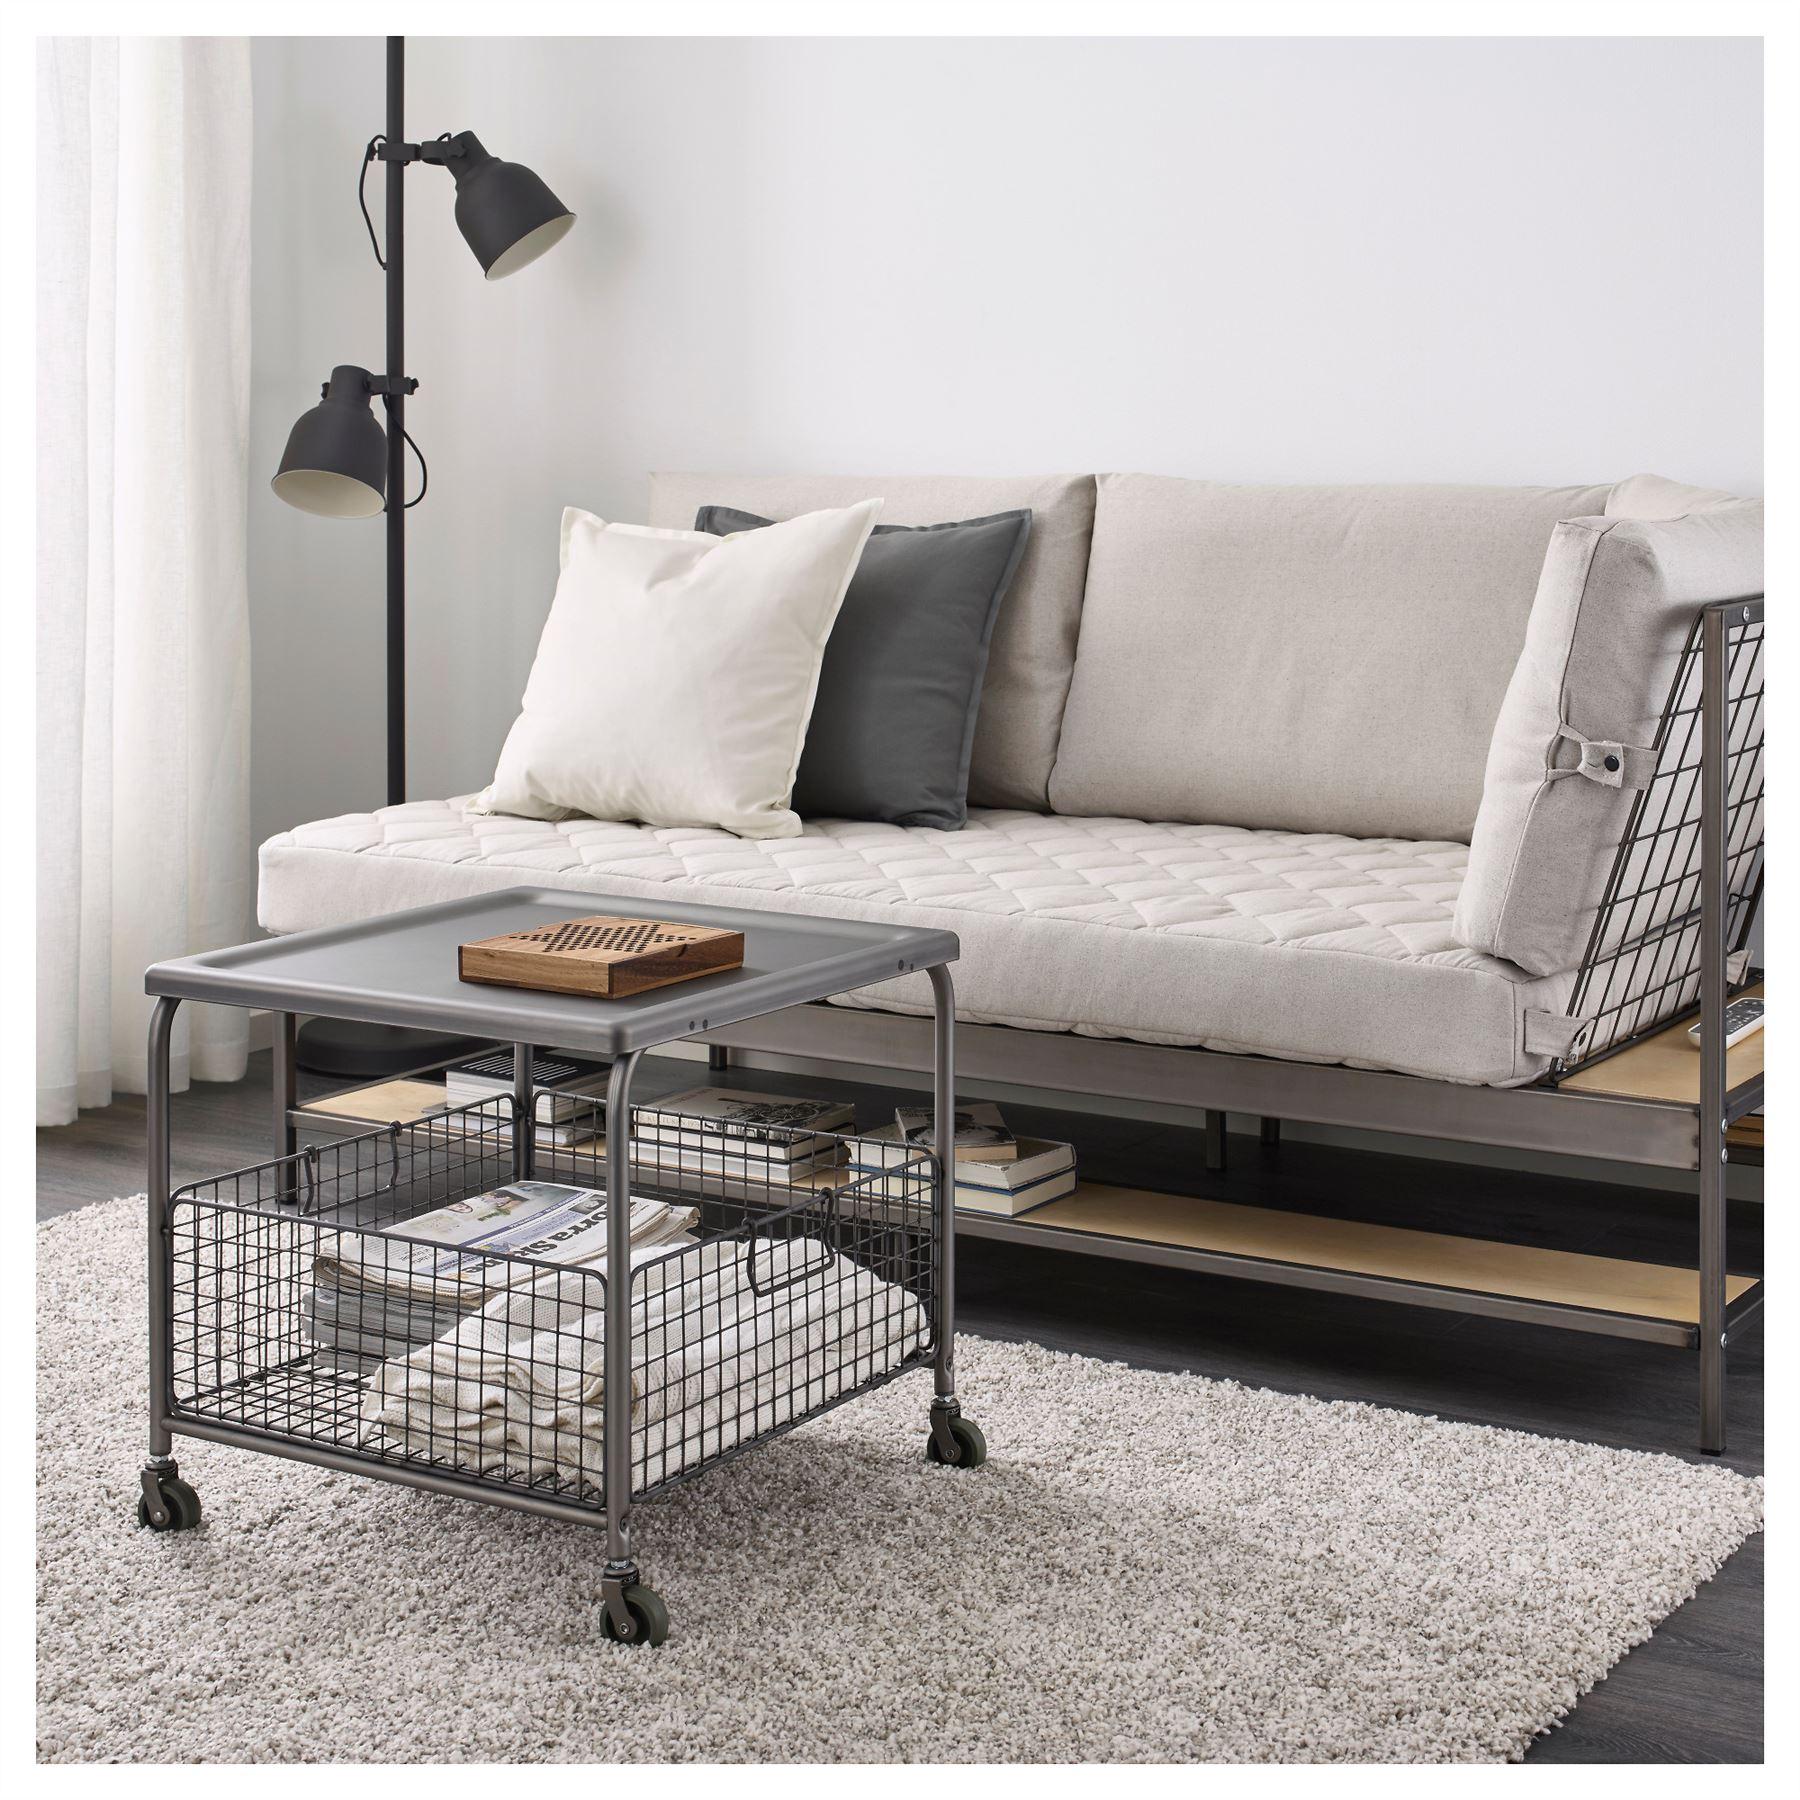 Ikea Lallerod Coffee Table with Storage Basket on Castors Steel